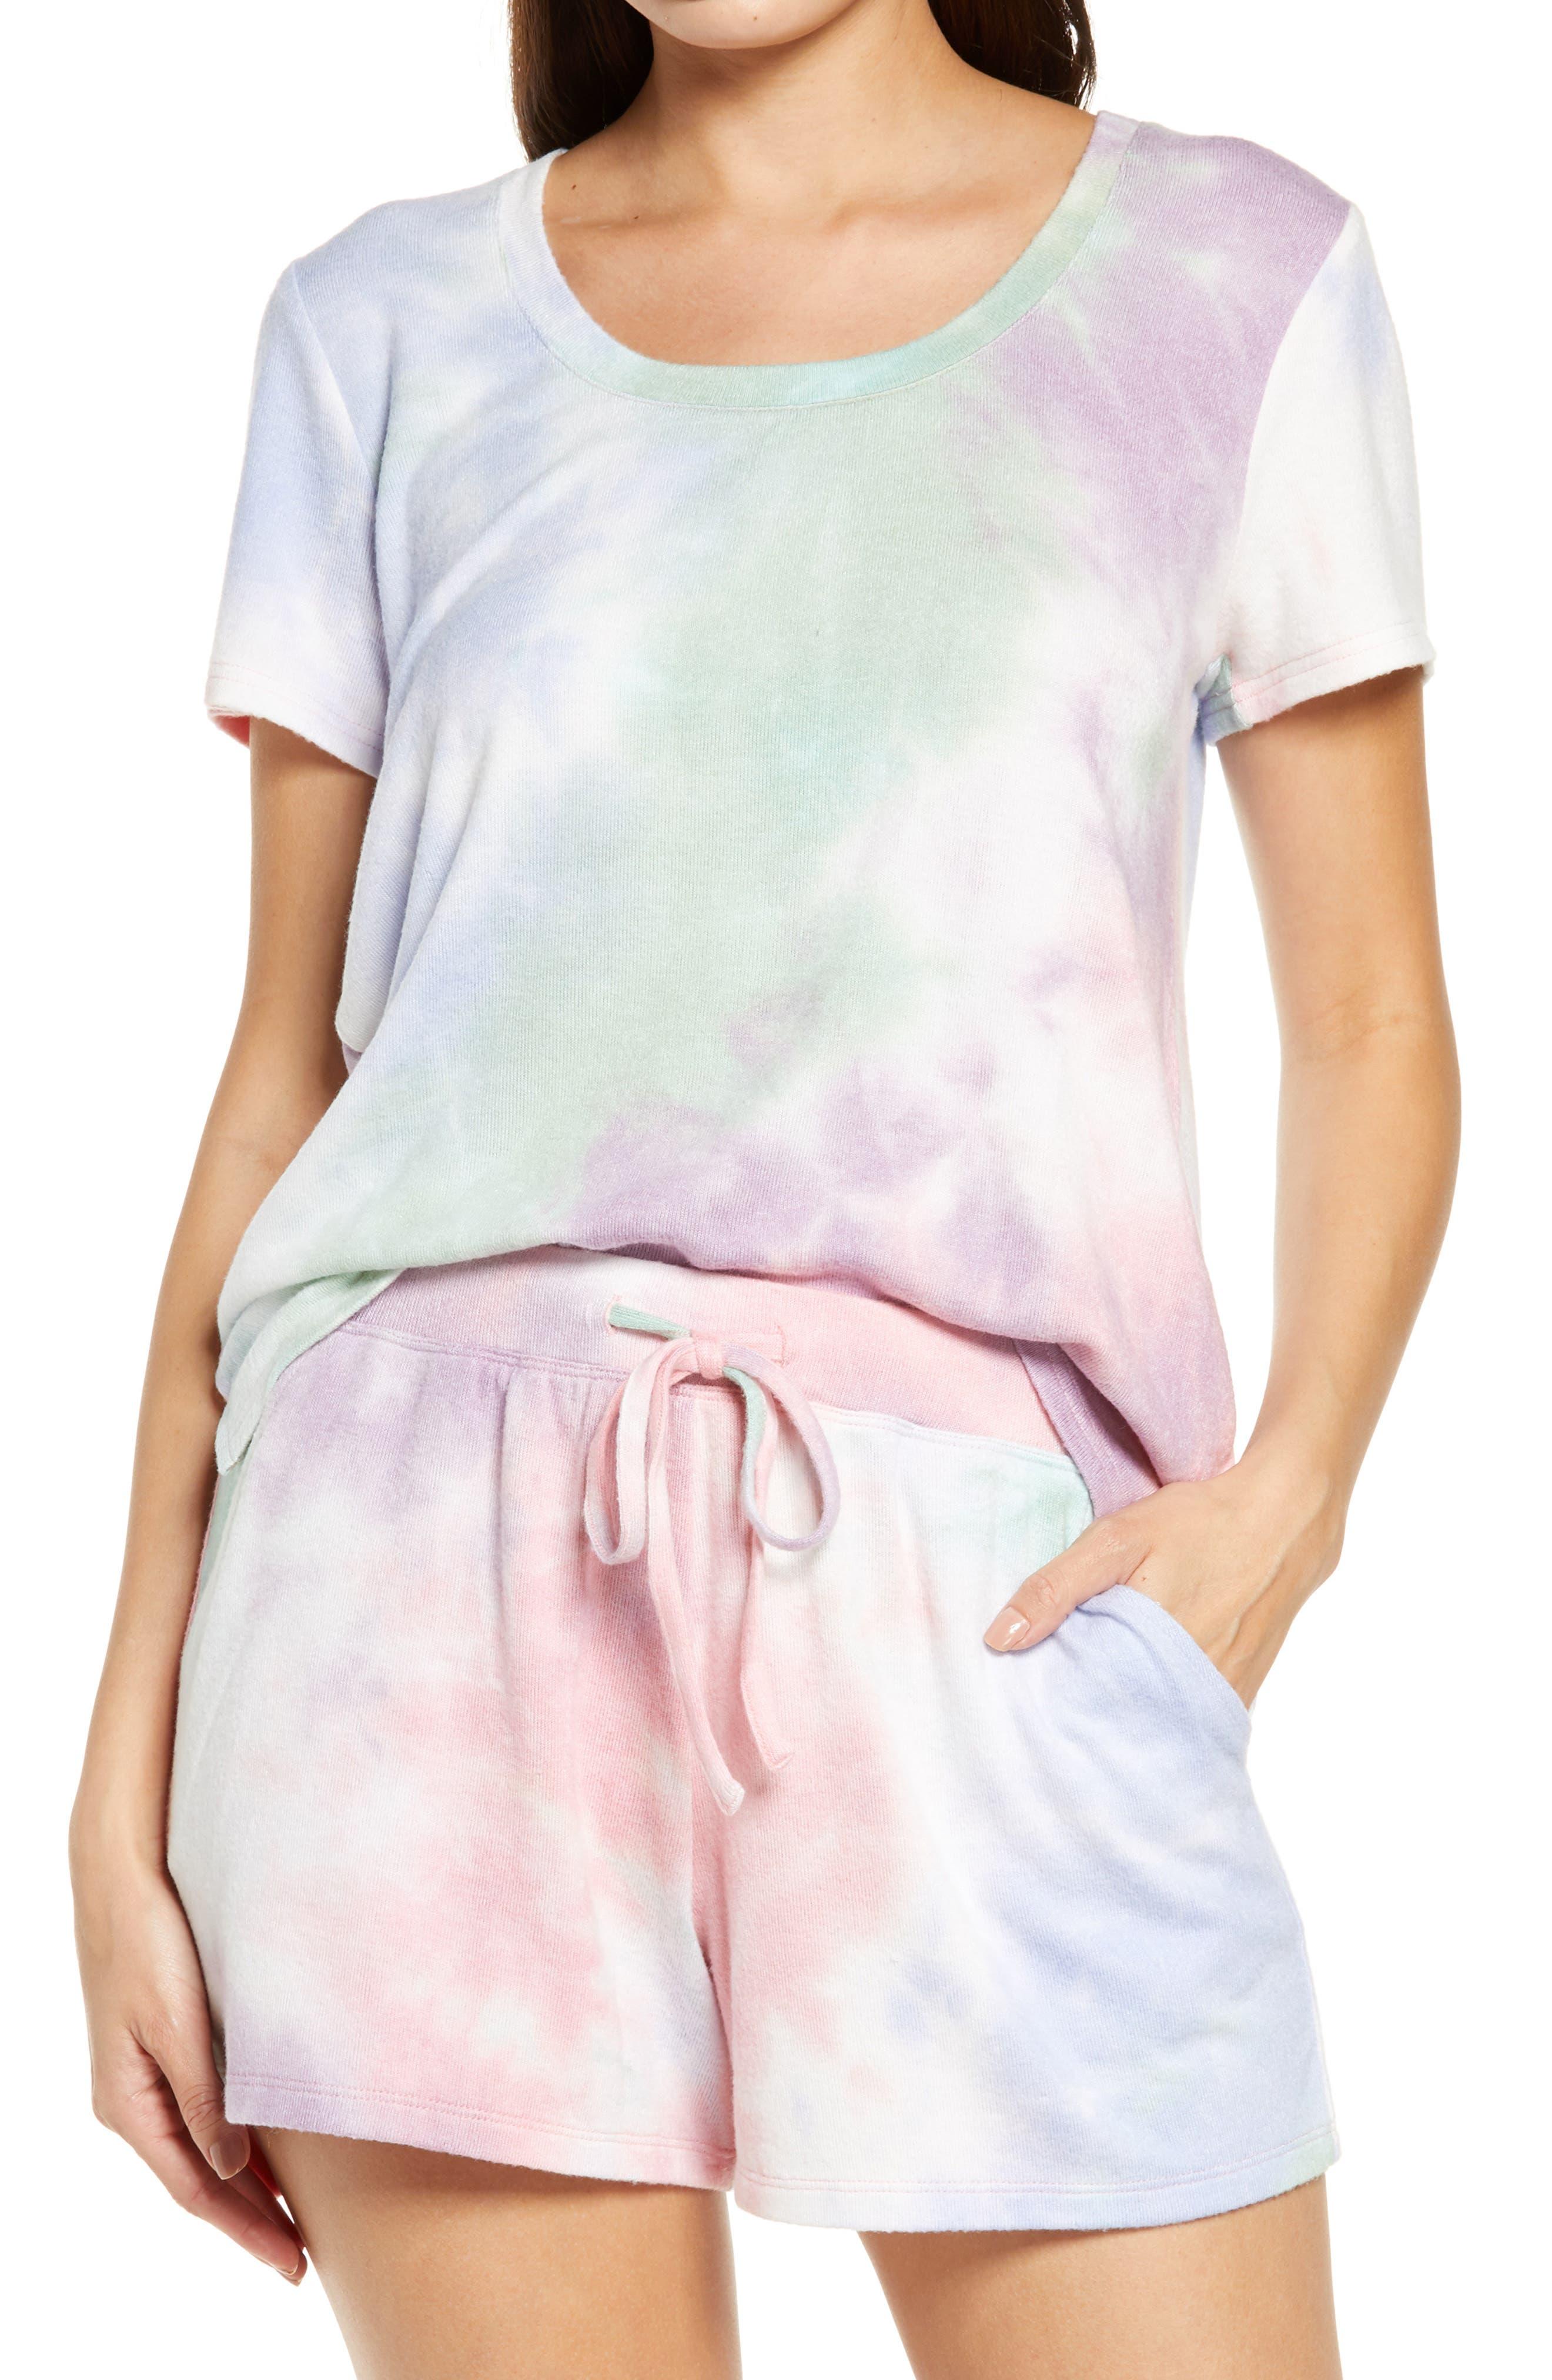 Scoop Neck Hacci Knit Sleep T-Shirt